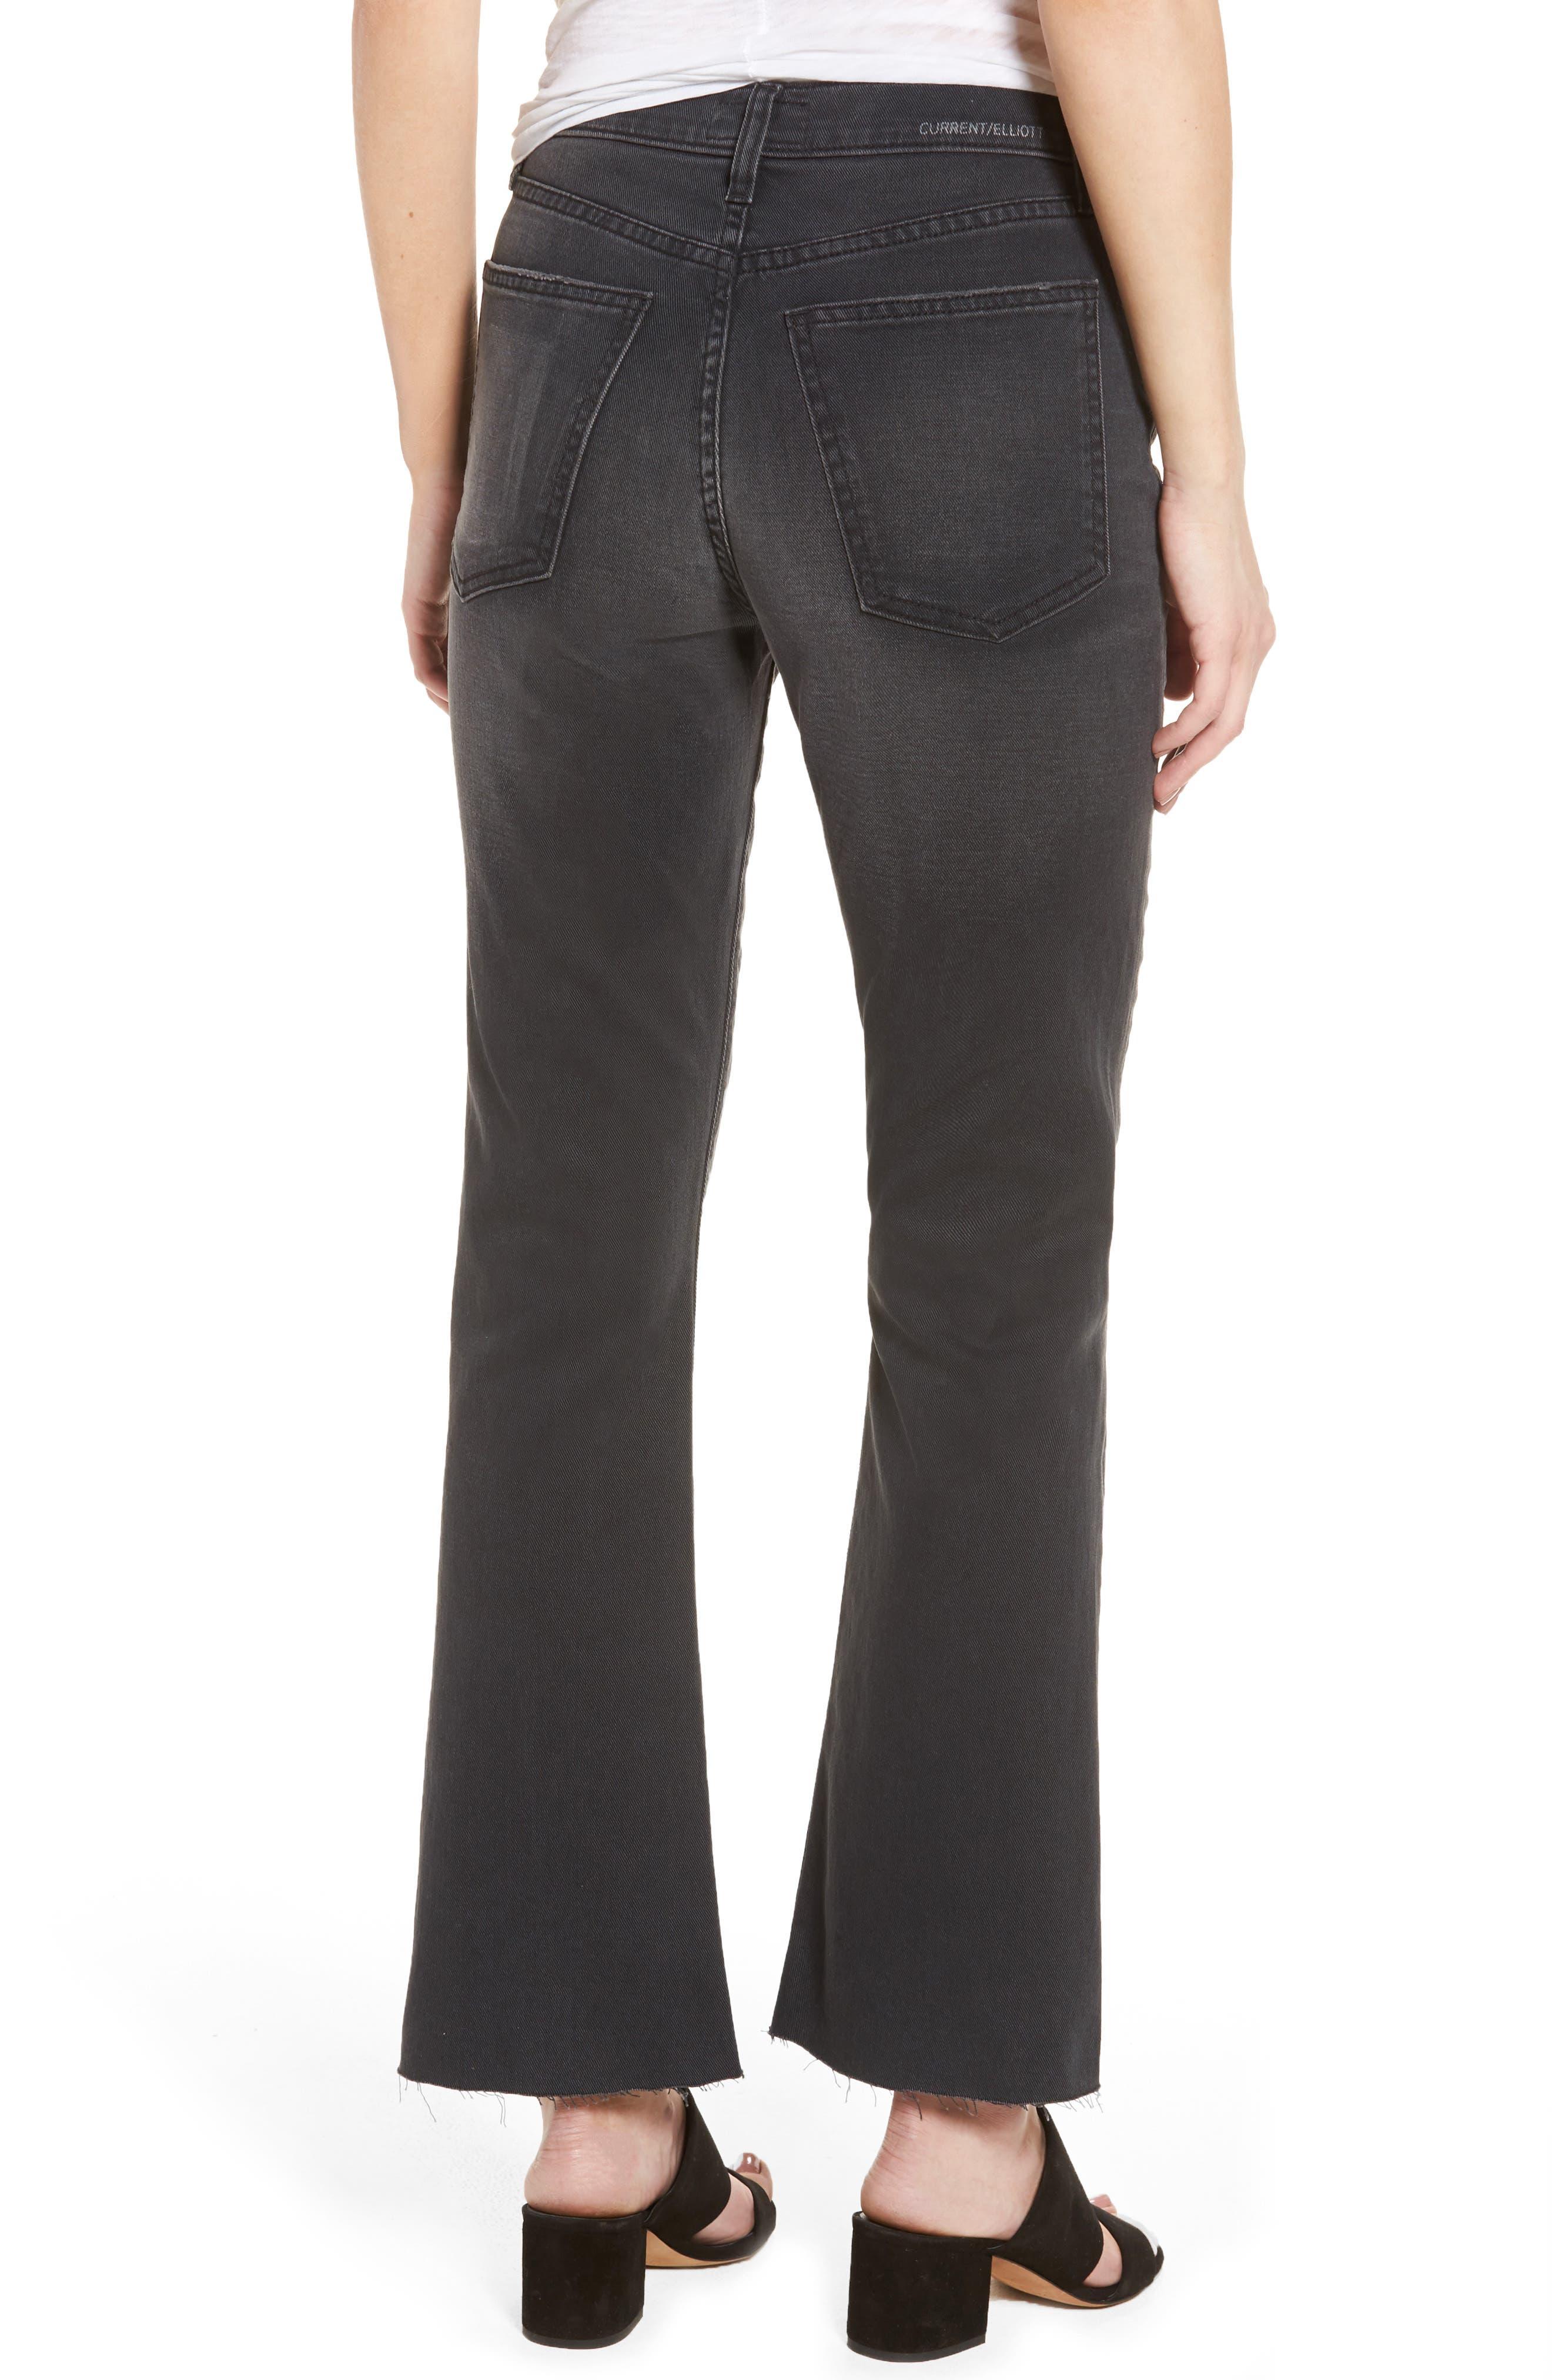 The Kick High Waist Crop Flare Jeans,                             Alternate thumbnail 2, color,                             017